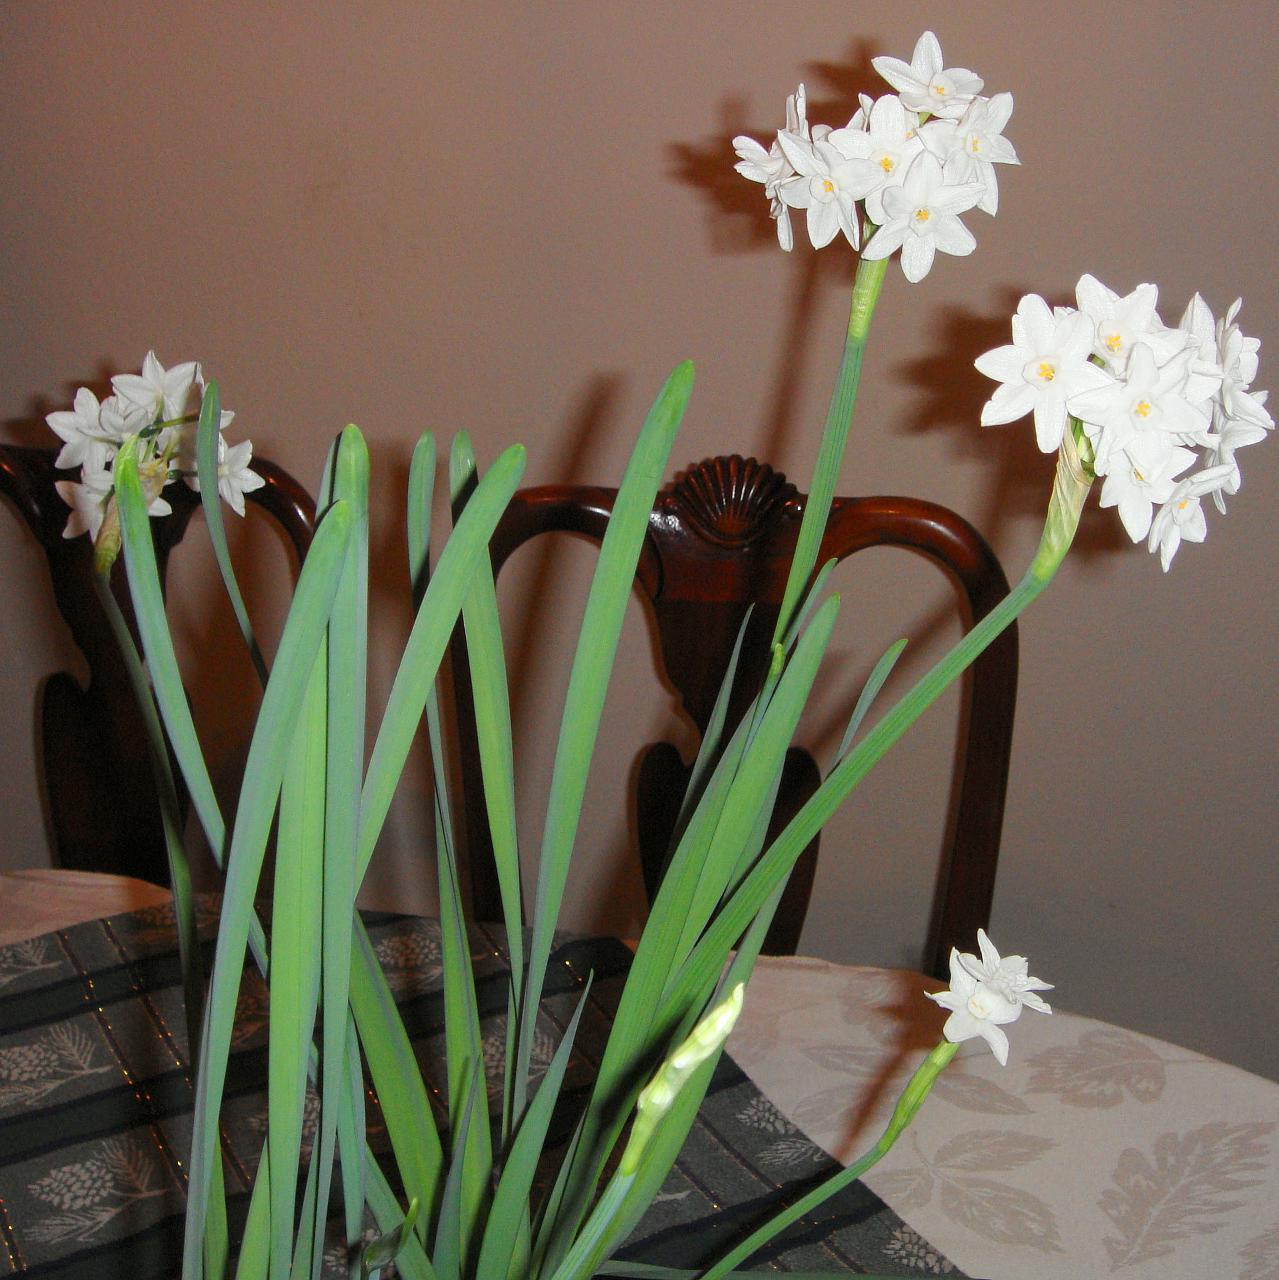 Paperwhite blooms